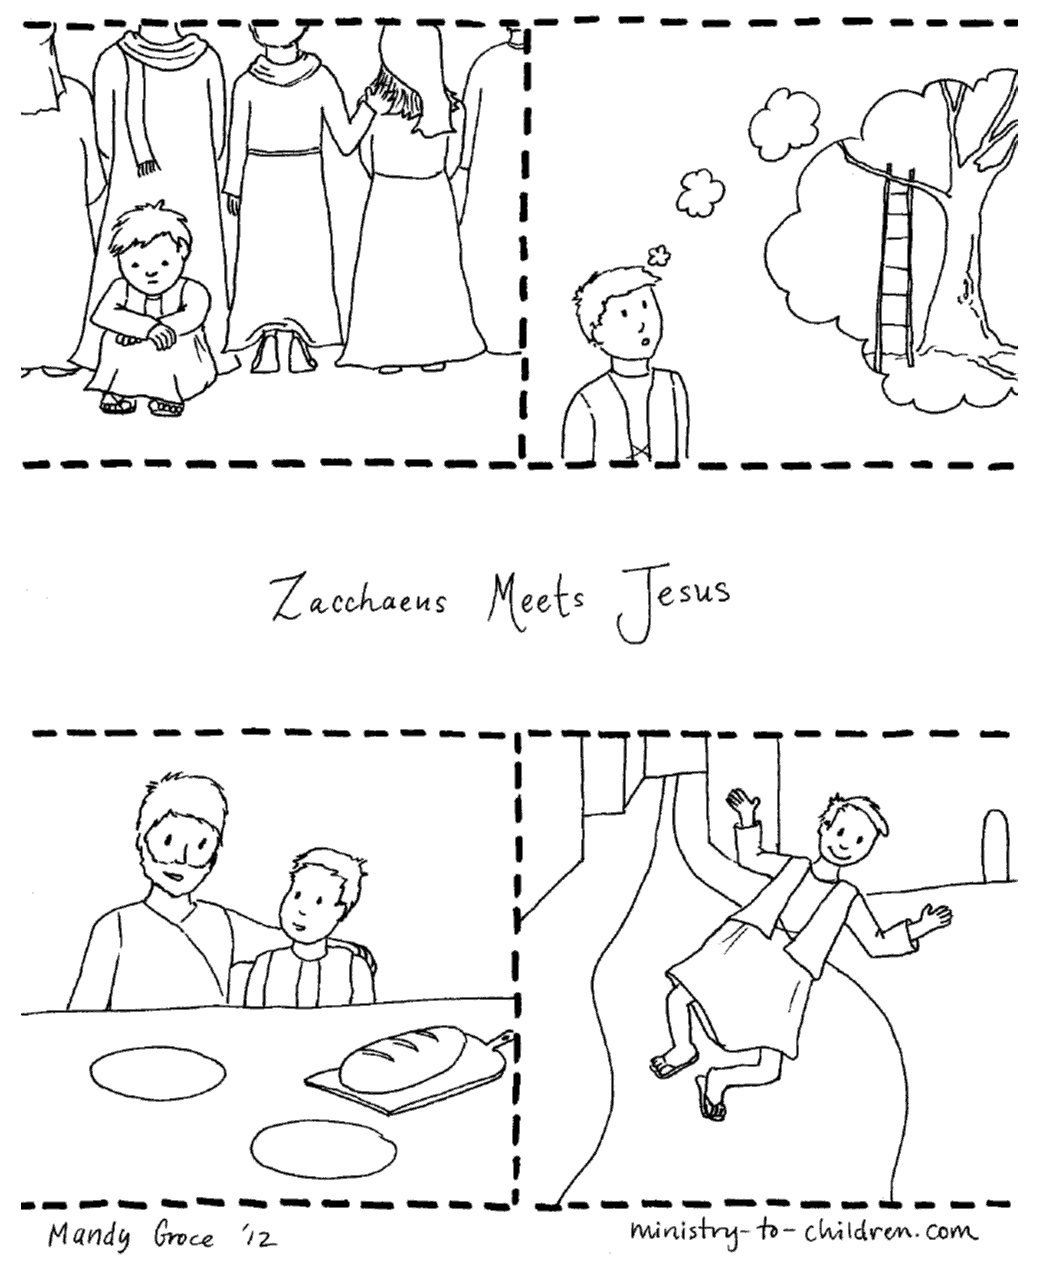 Zacchaeus Amp Jesus Coloring Page Free Printable